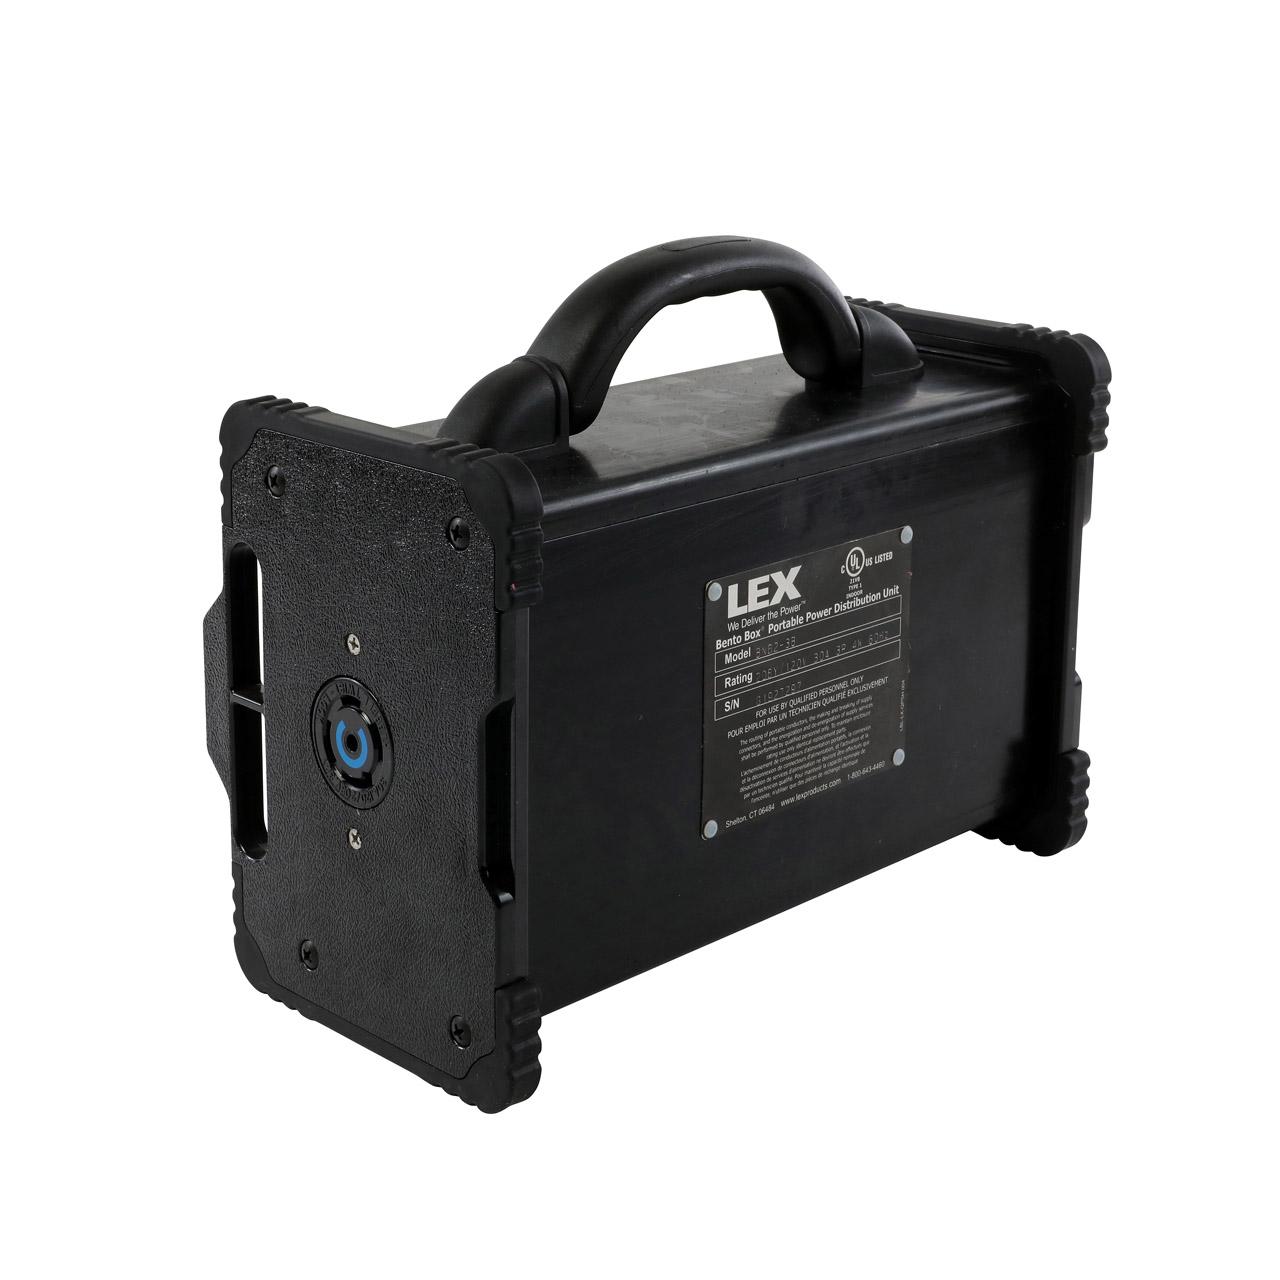 30 Amp Bento Box® with Duplex Receptacles